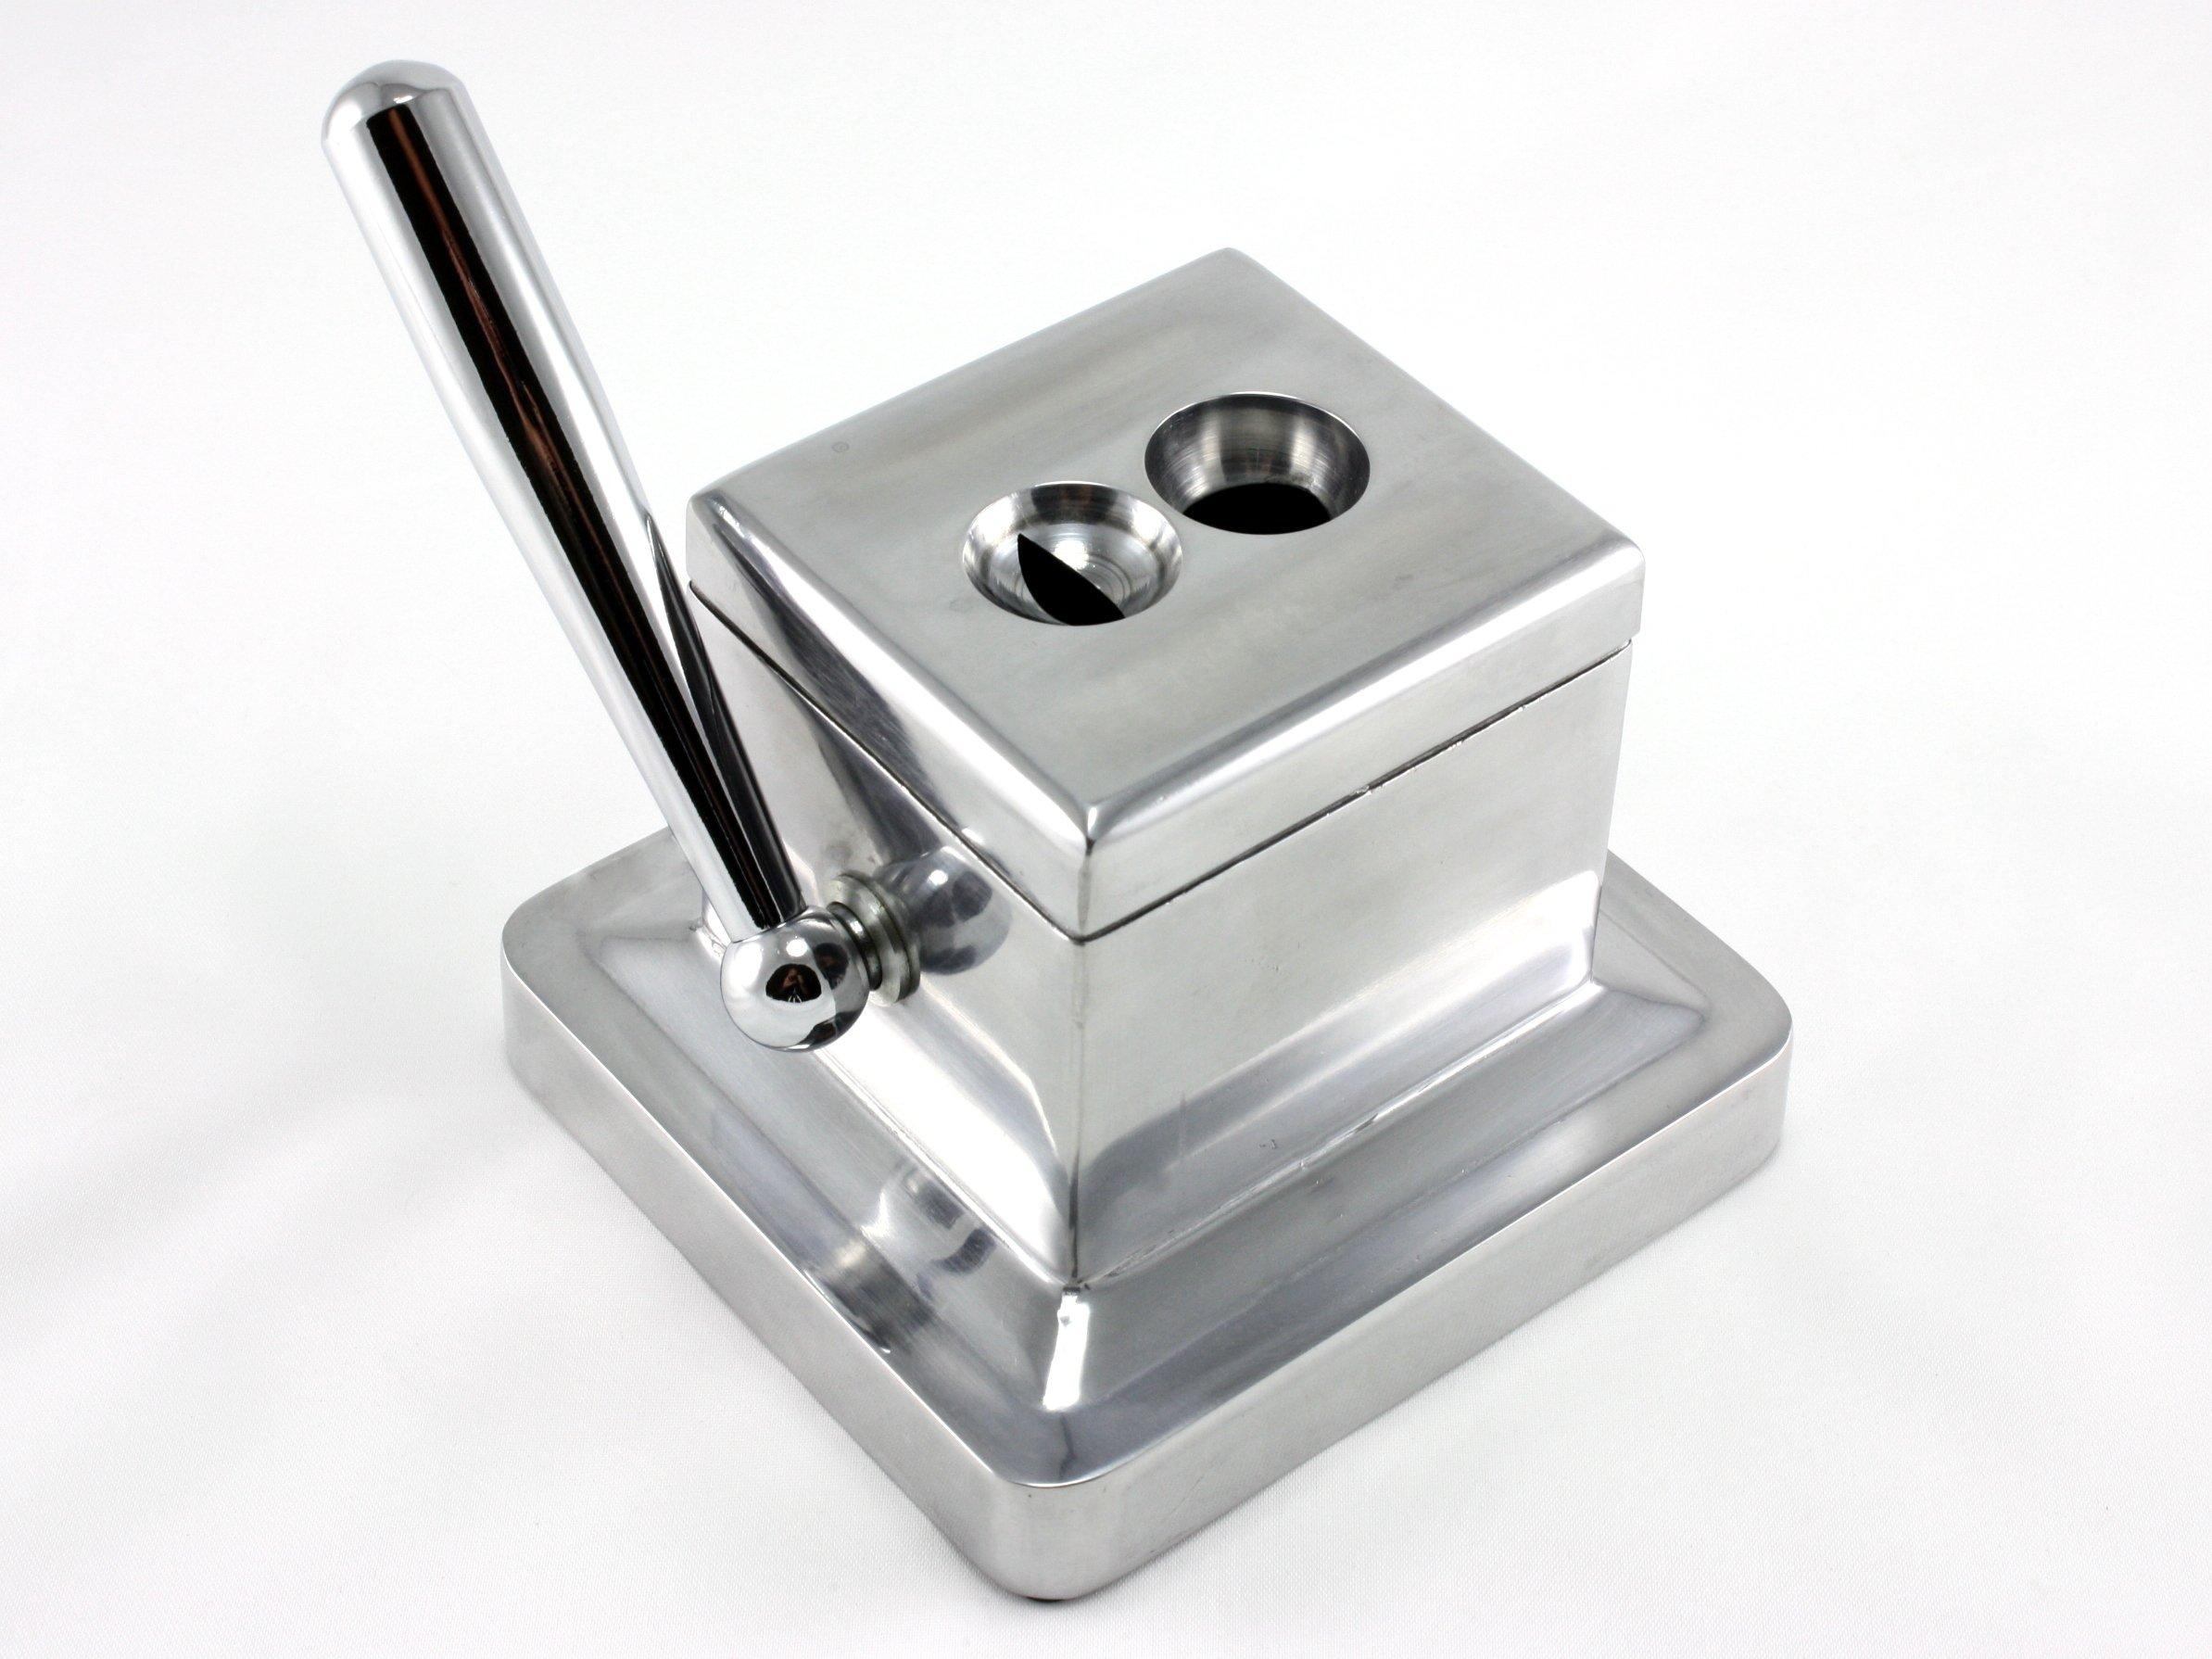 Scorpion Table Top Desk Cigar Cutter Guillotine & V Cut - Silver